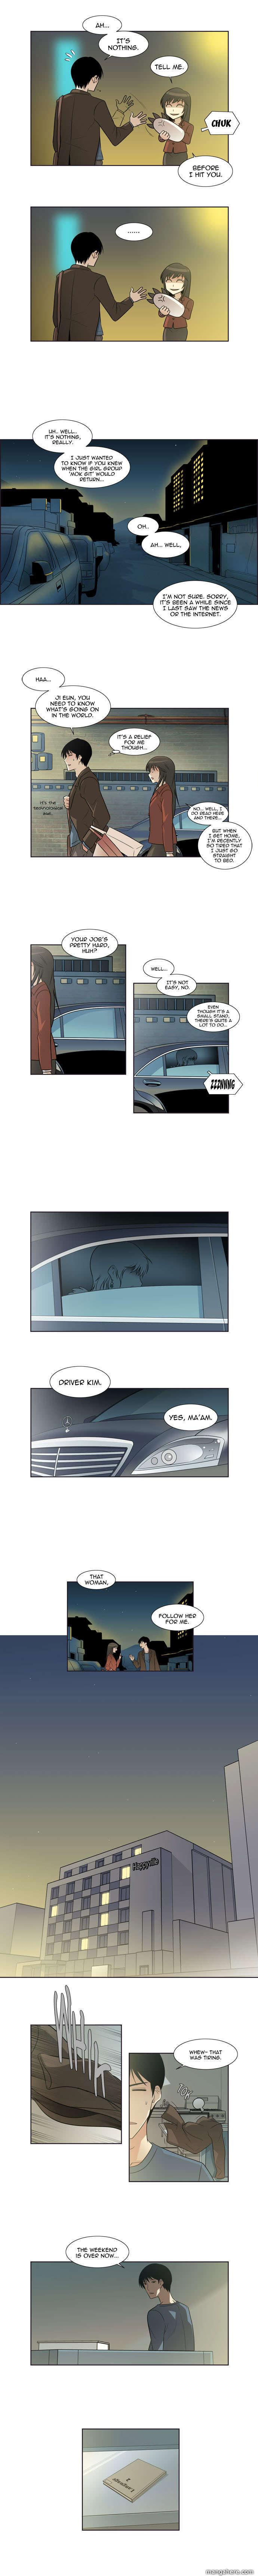 Melo Holic 53 Page 2